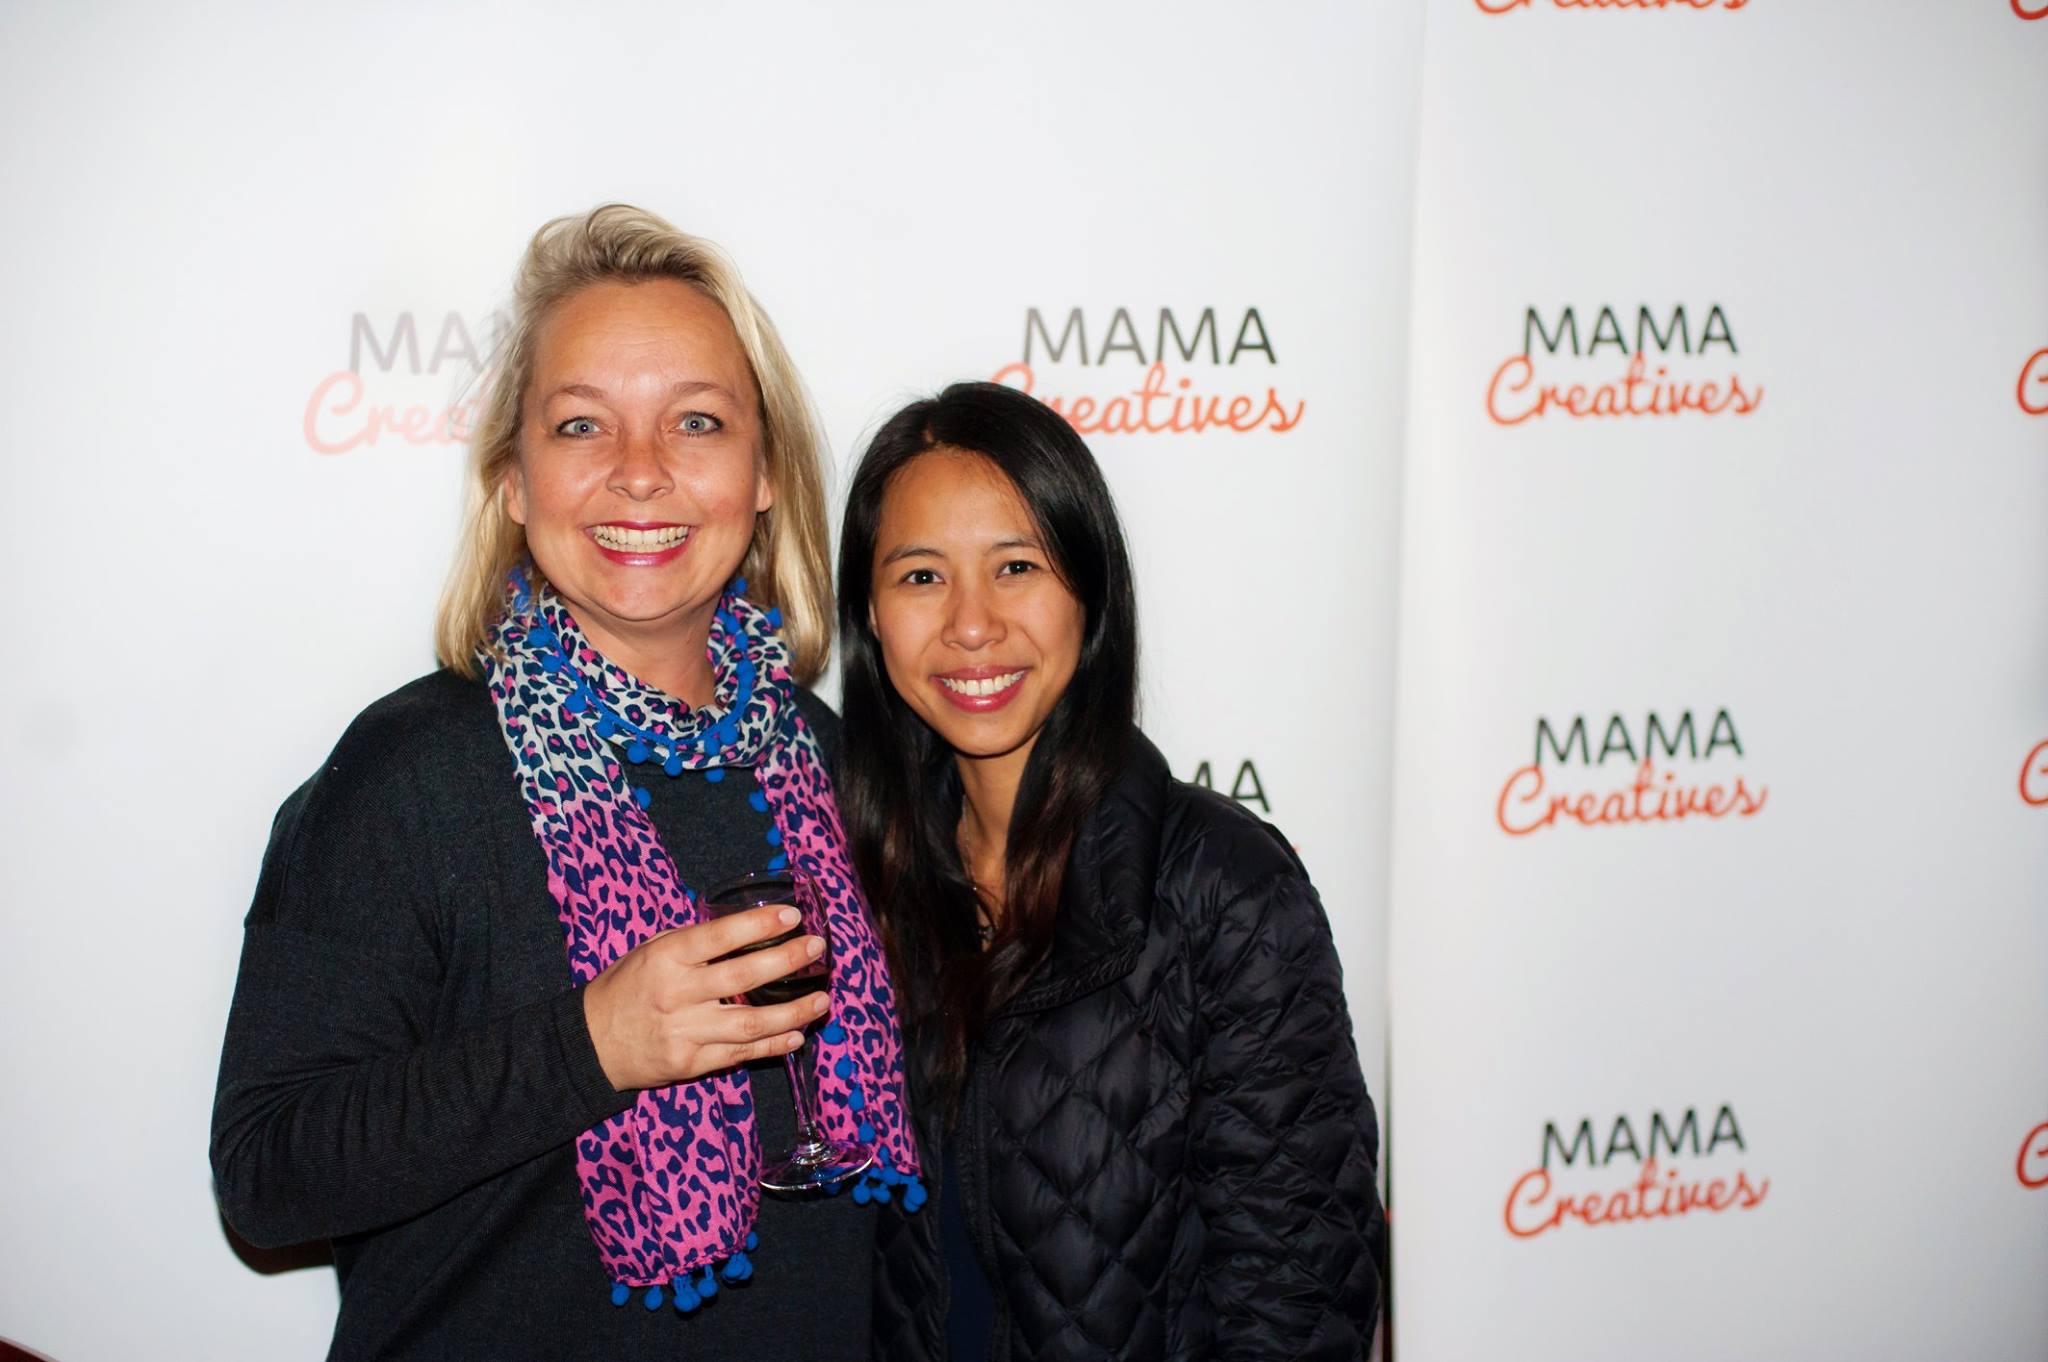 Two creative women, Emma Veiga-Malta, founder of Bespoke Backdrops with photographer Mariam.